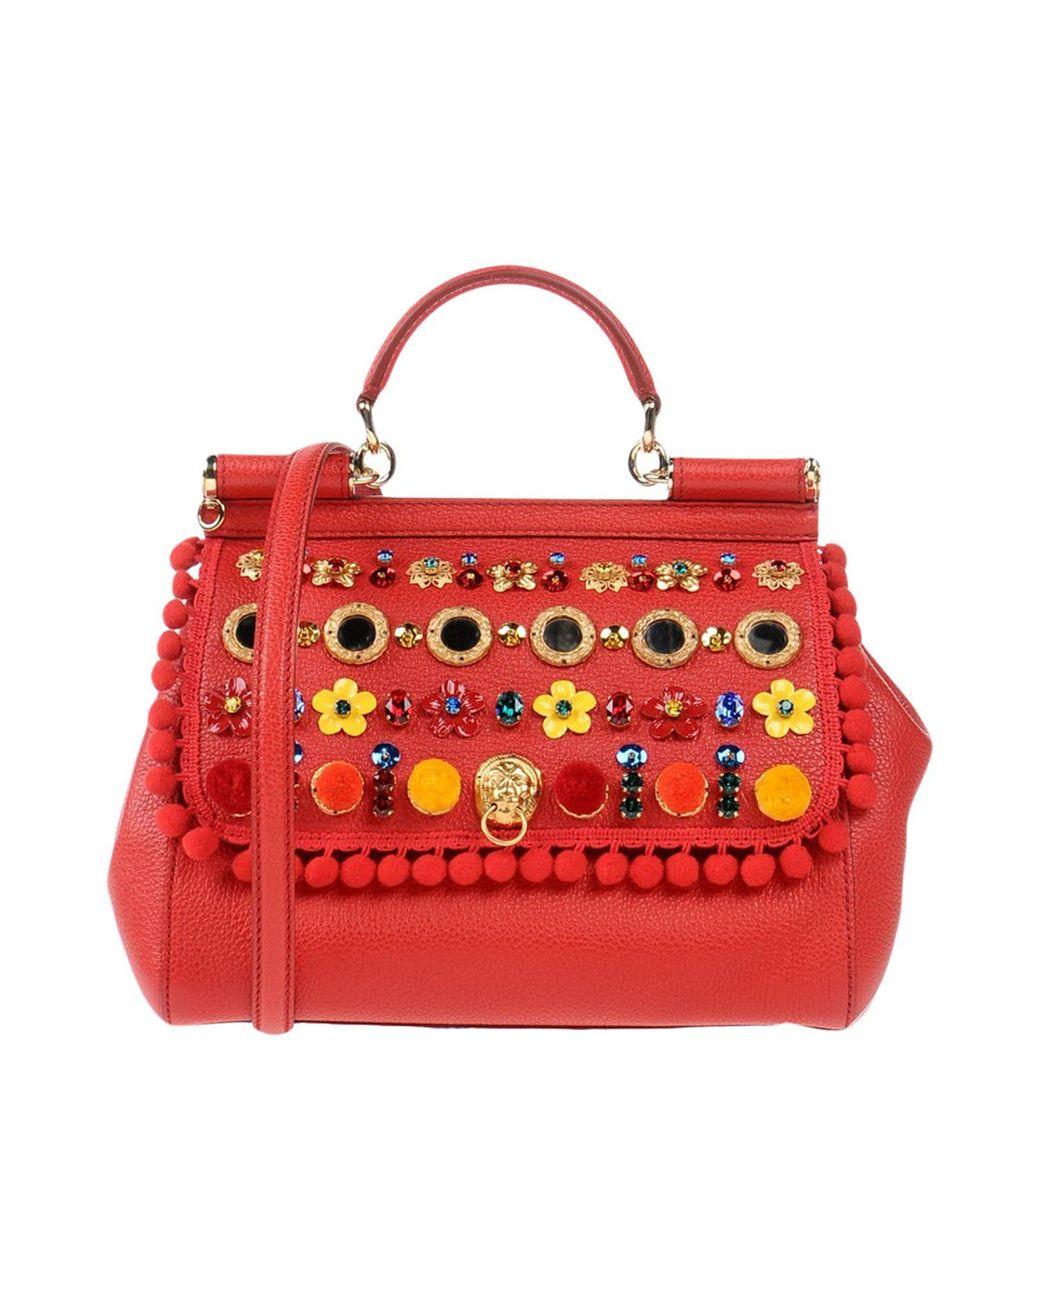 Dolce gabbana сумка красная